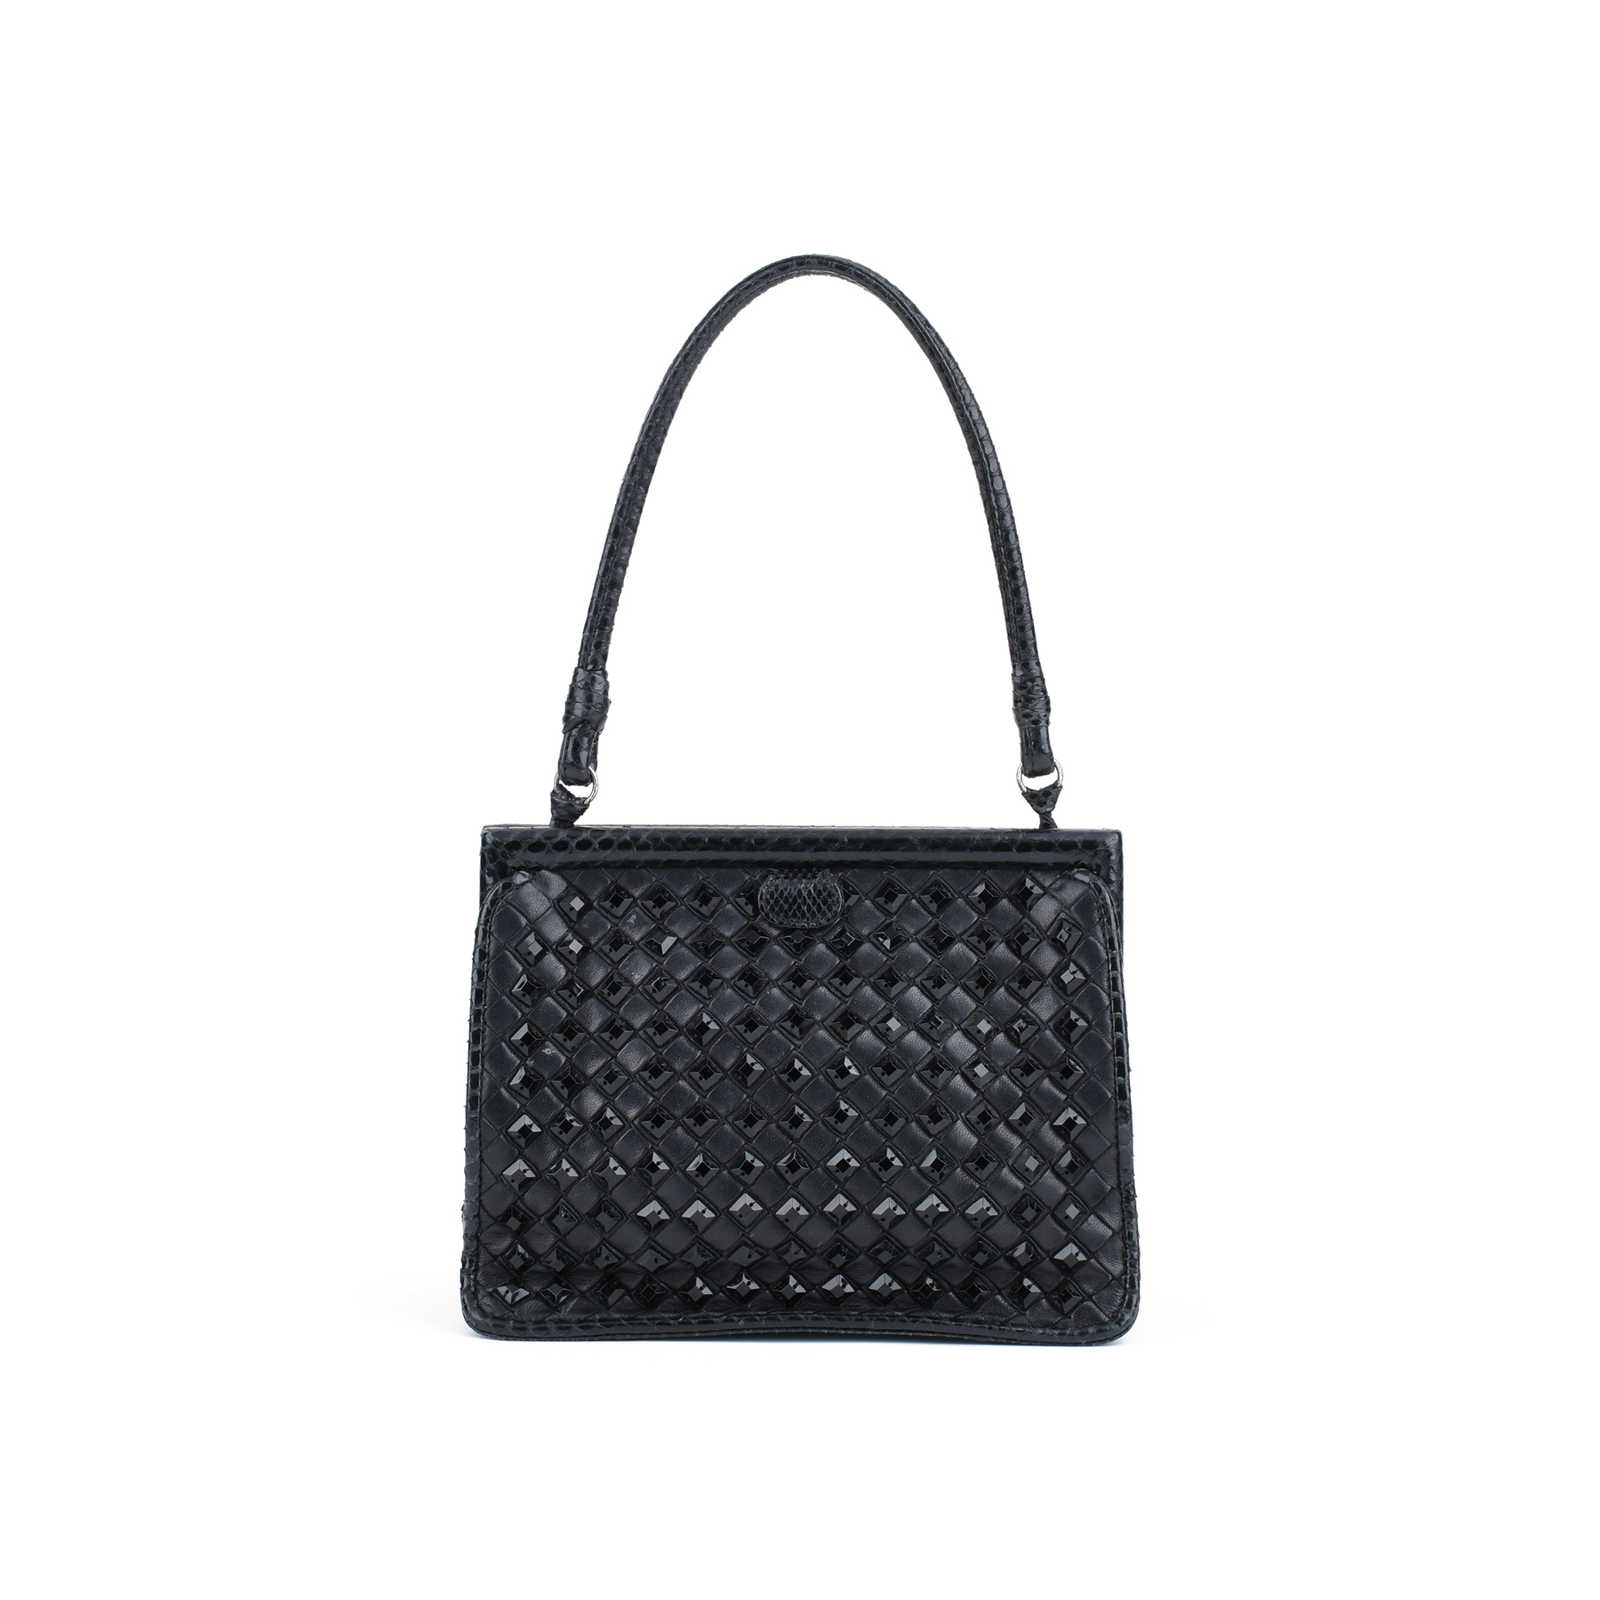 62e7d316ce Authentic Second Hand Bottega Veneta Intrecciato Evening Bag  (PSS-420-00038) ...